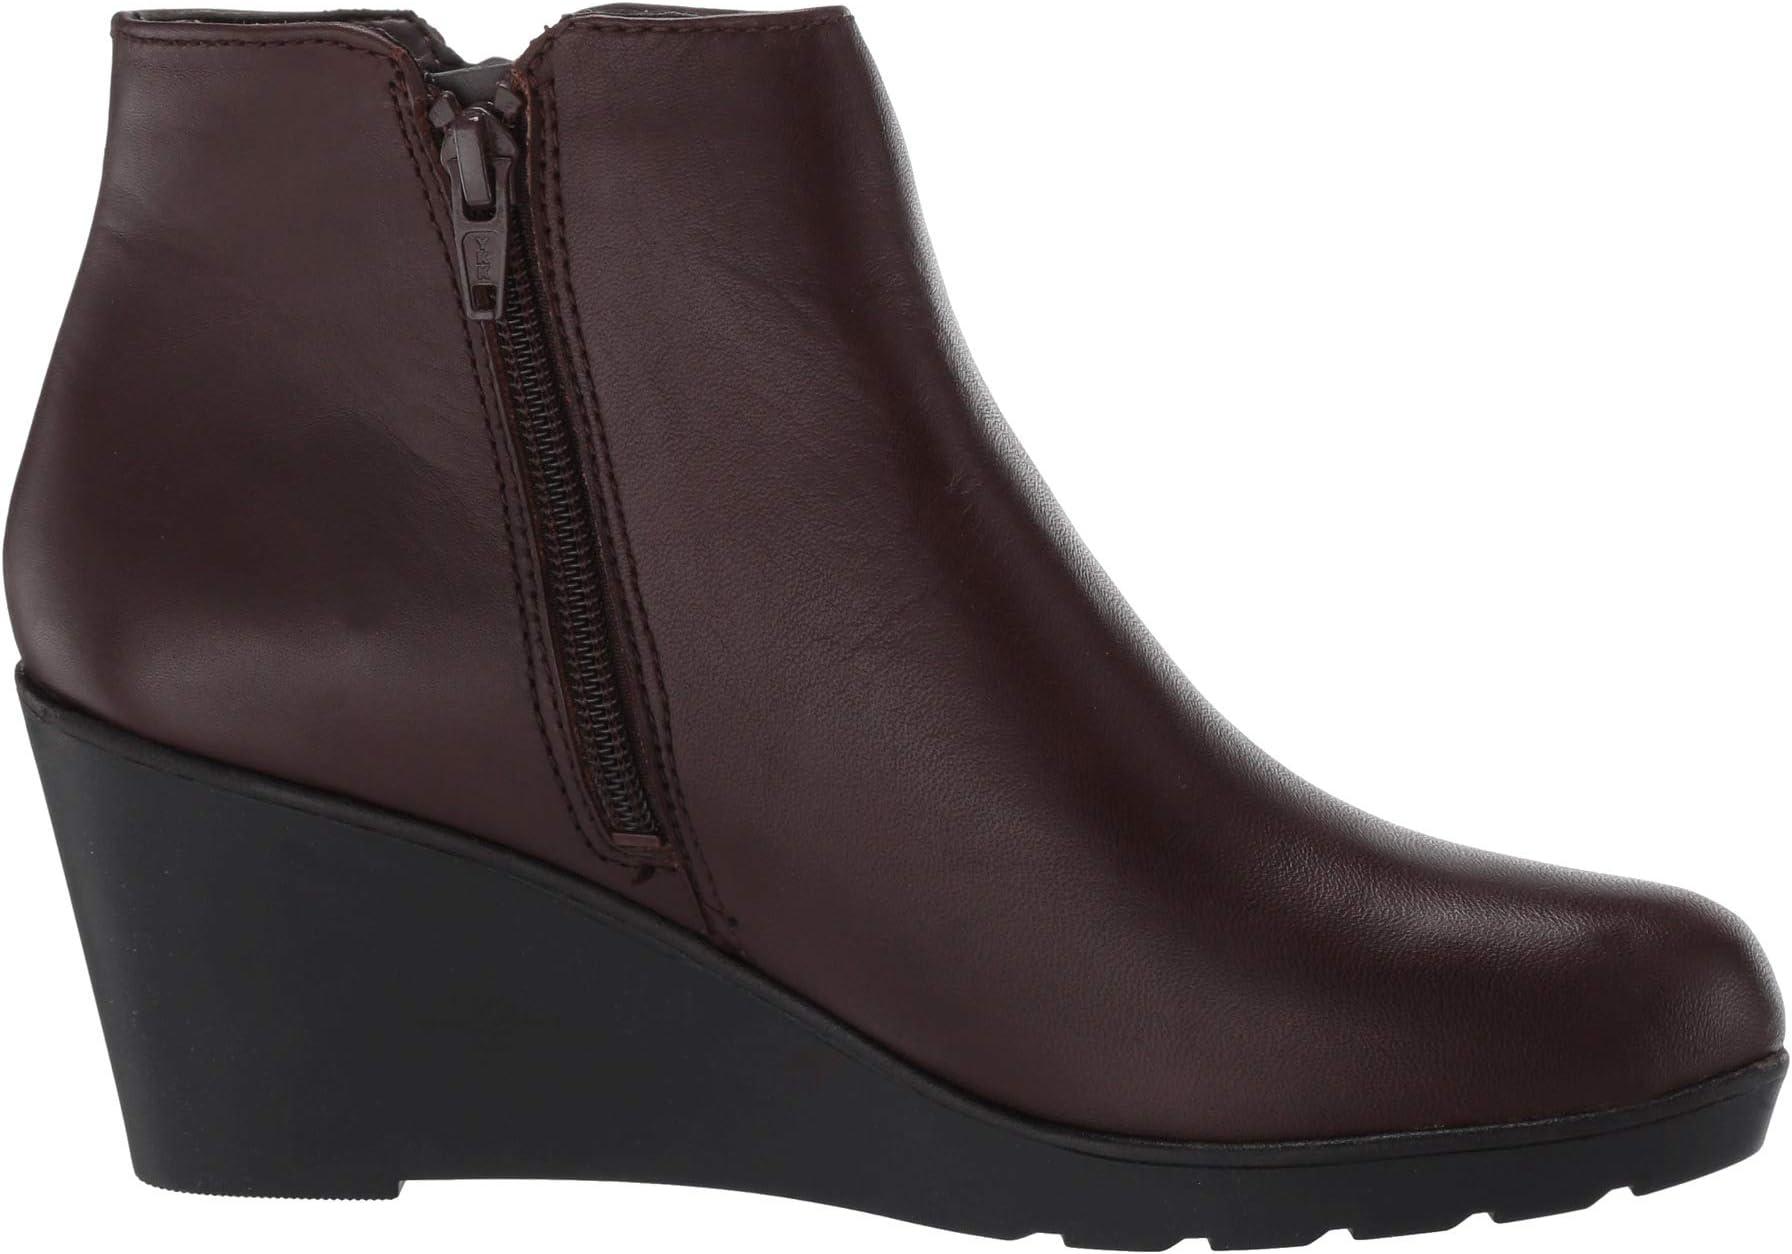 Naturalizer Landry   Women's shoes   2020 Newest